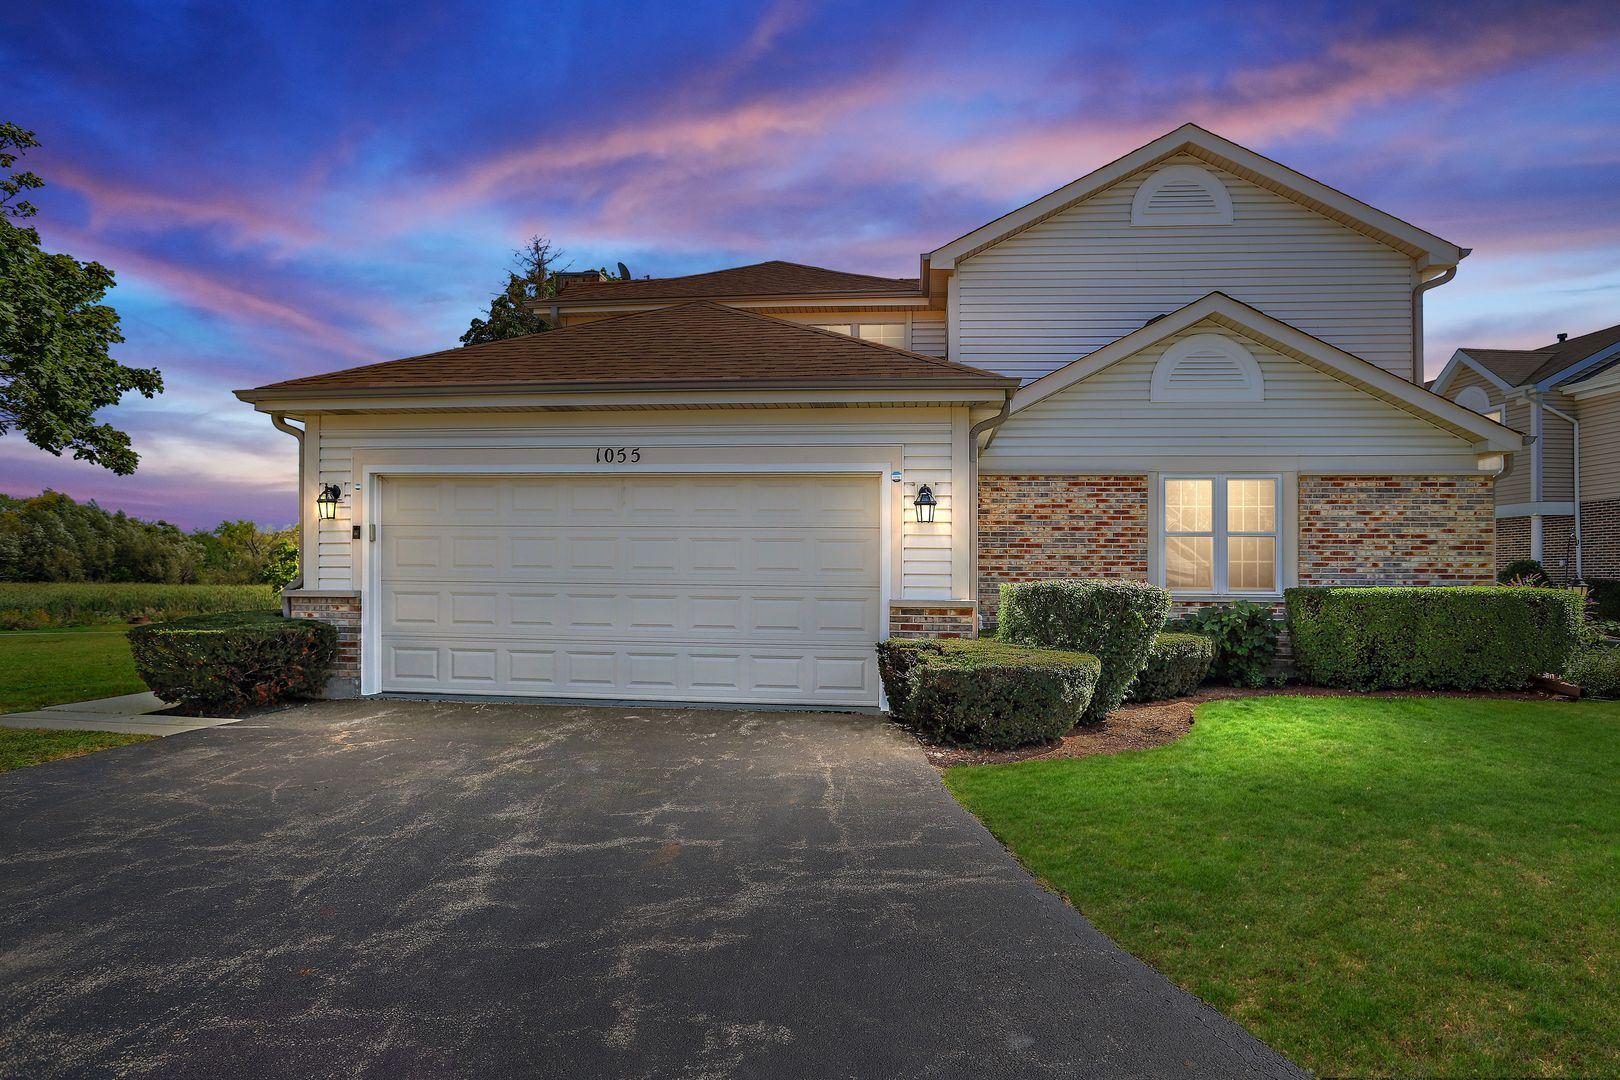 1055 Sweetflower Drive #1055, Hoffman Estates, IL 60169 - #: 11234872